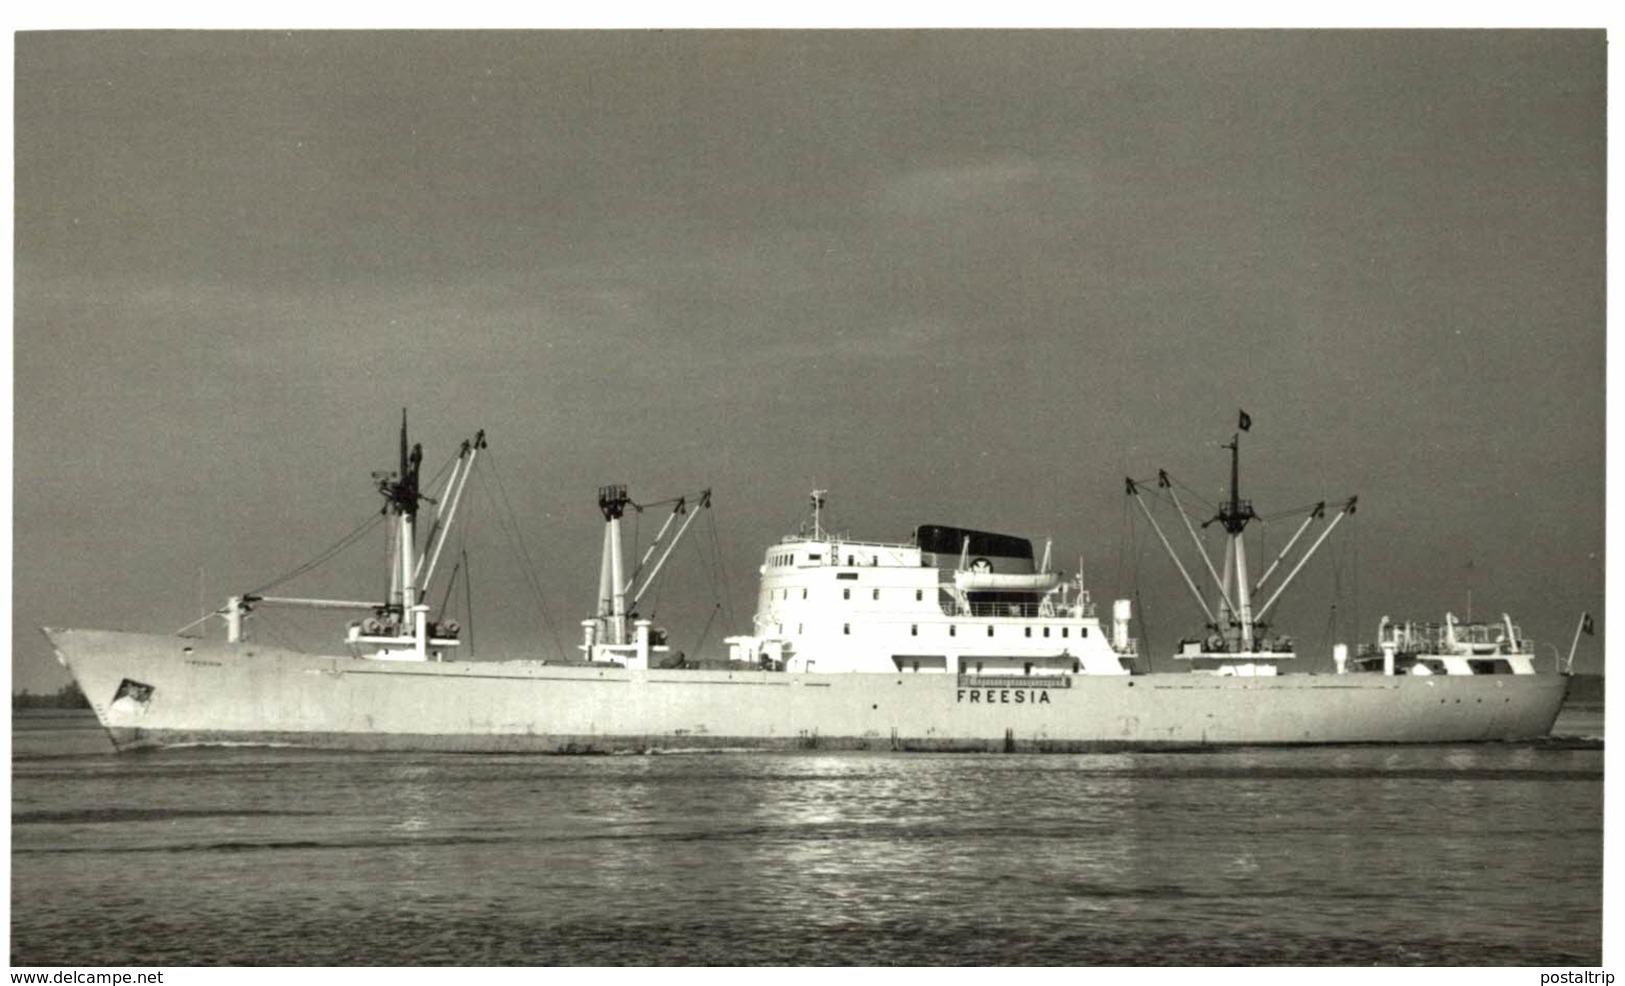 FREESIA 13,5 X 9 Cm  BARCO, BATEAU, SHIP  DINAMARCA, DENMARK, DANEMARK - Barcos